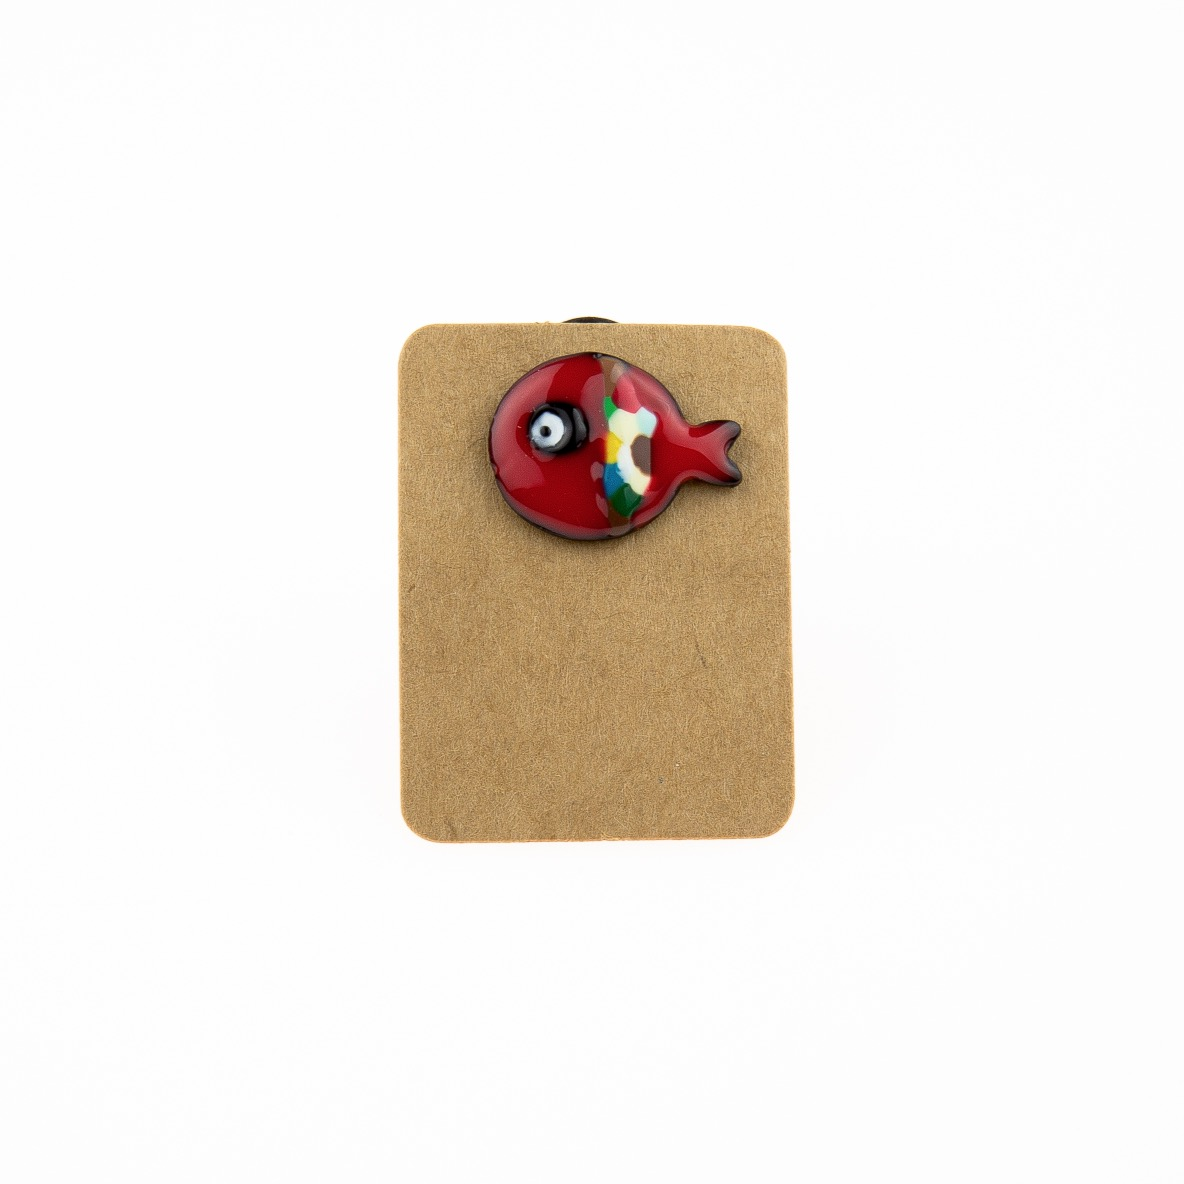 Metal Red Fish Devil Eye Enamel Pin Badge